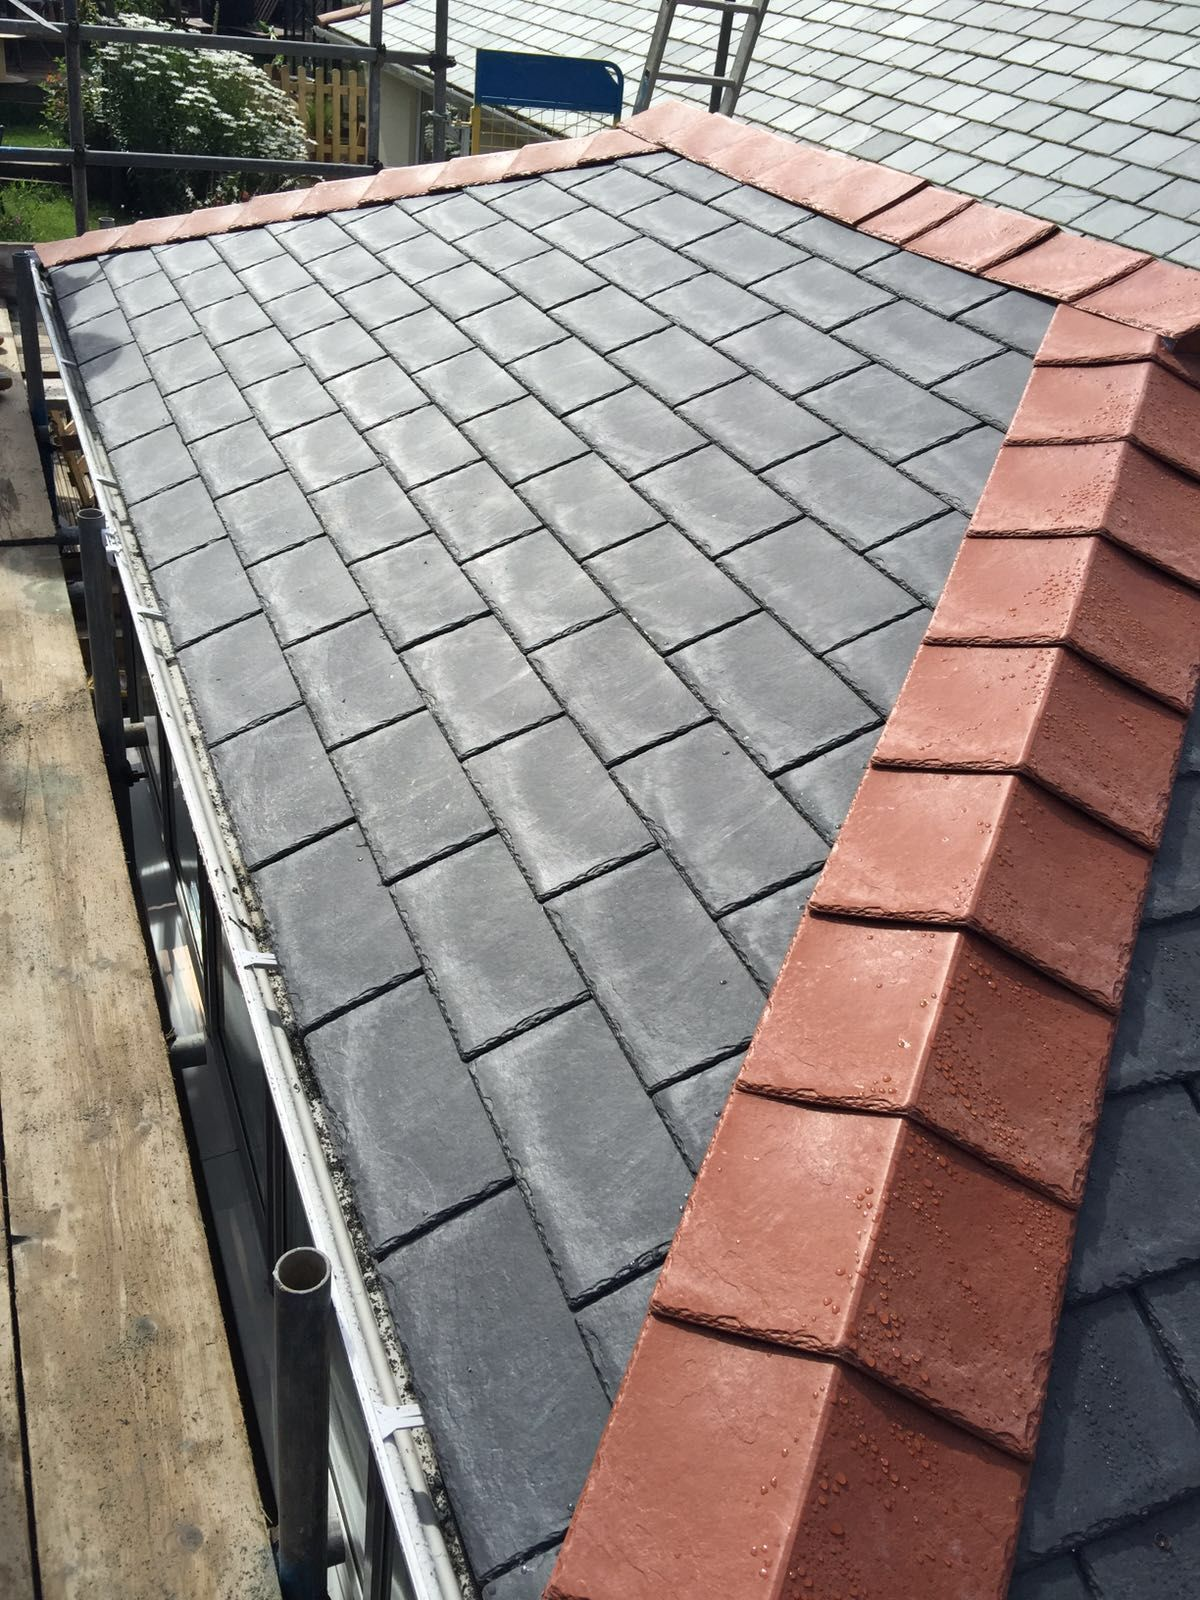 Ags Windows Newton Abbot Edwardian Tiled Roof